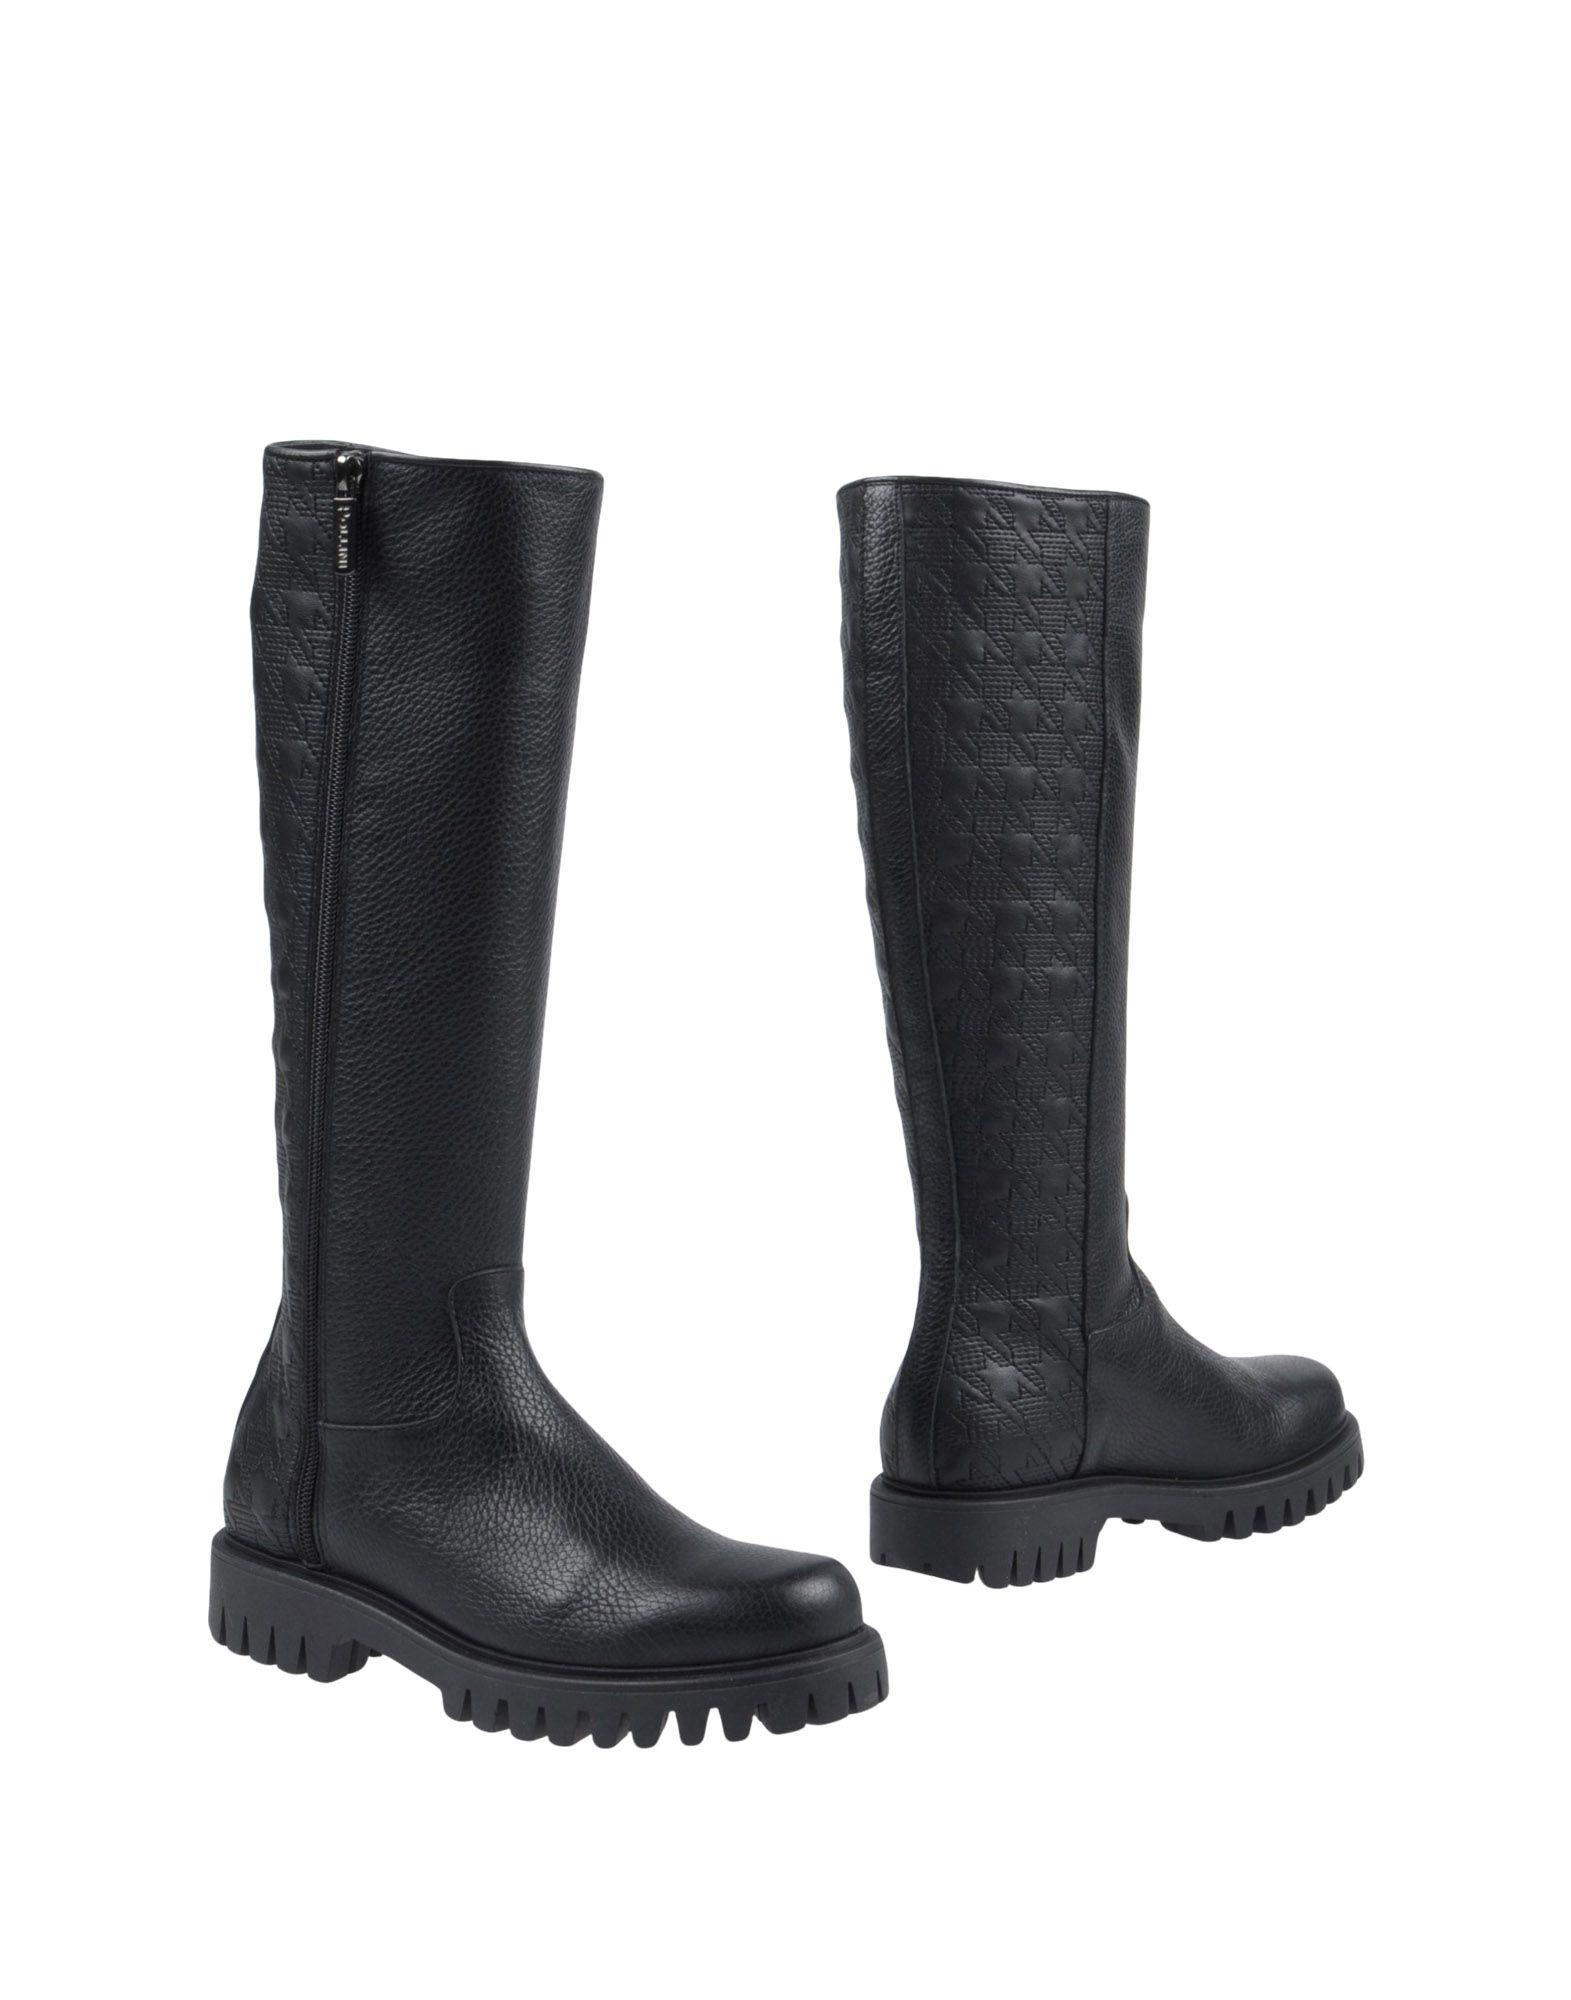 Pollini Stiefel Damen  11446693HOGut Schuhe aussehende strapazierfähige Schuhe 11446693HOGut 1a1f33